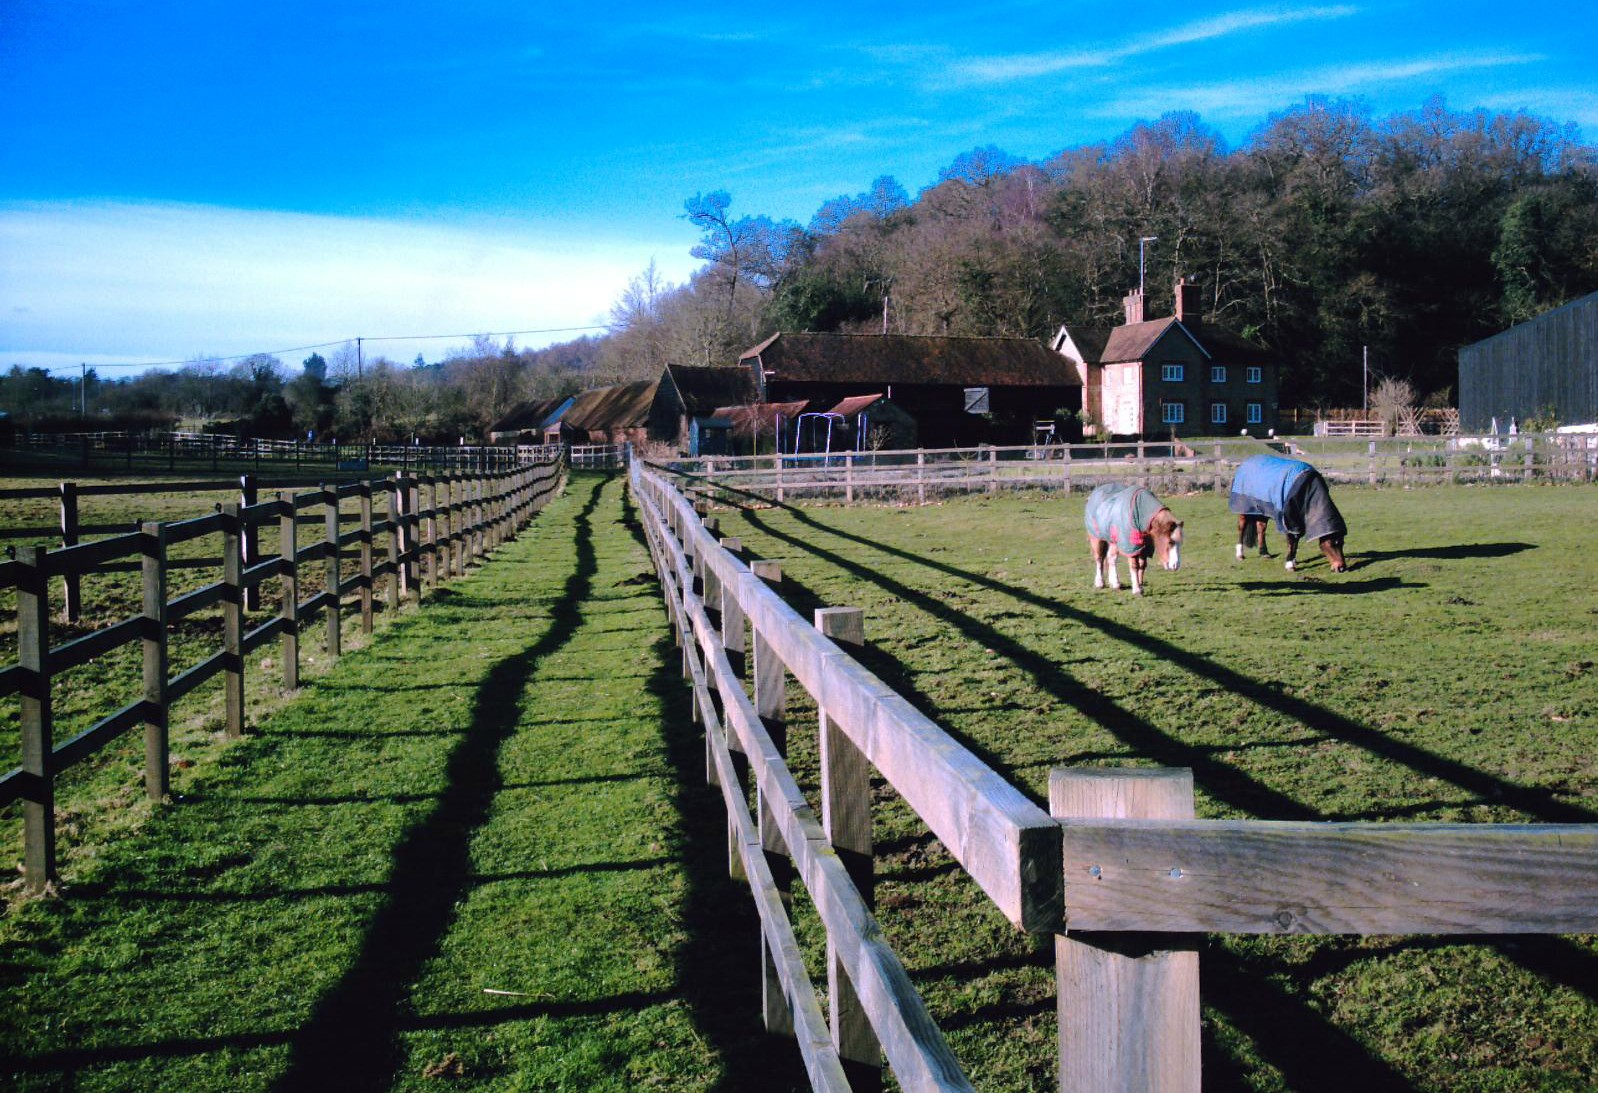 Book 1 Walk 2 Wanborough to Godalming Coneycroft Farm near Compton Surrey. D.Allen Vivitar 5199mp